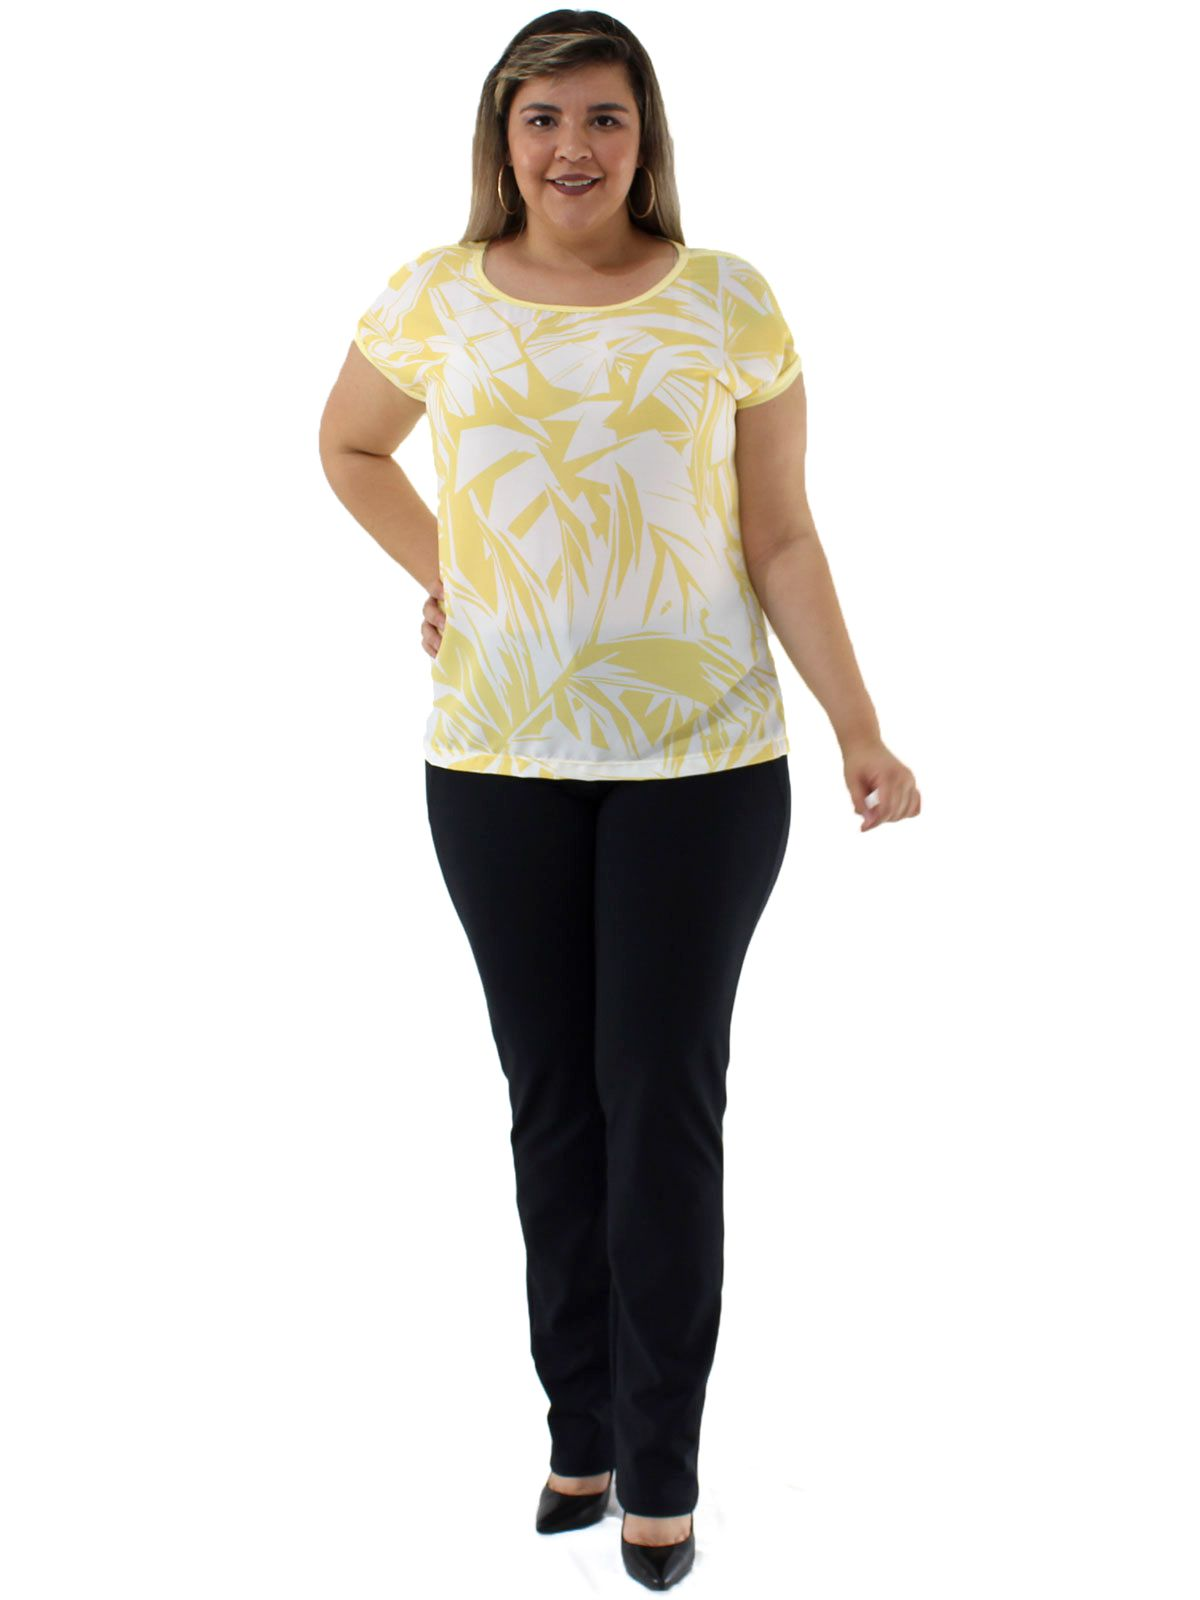 Blusa Plus Size Feminina Decote Redondo Estampada Amarelo